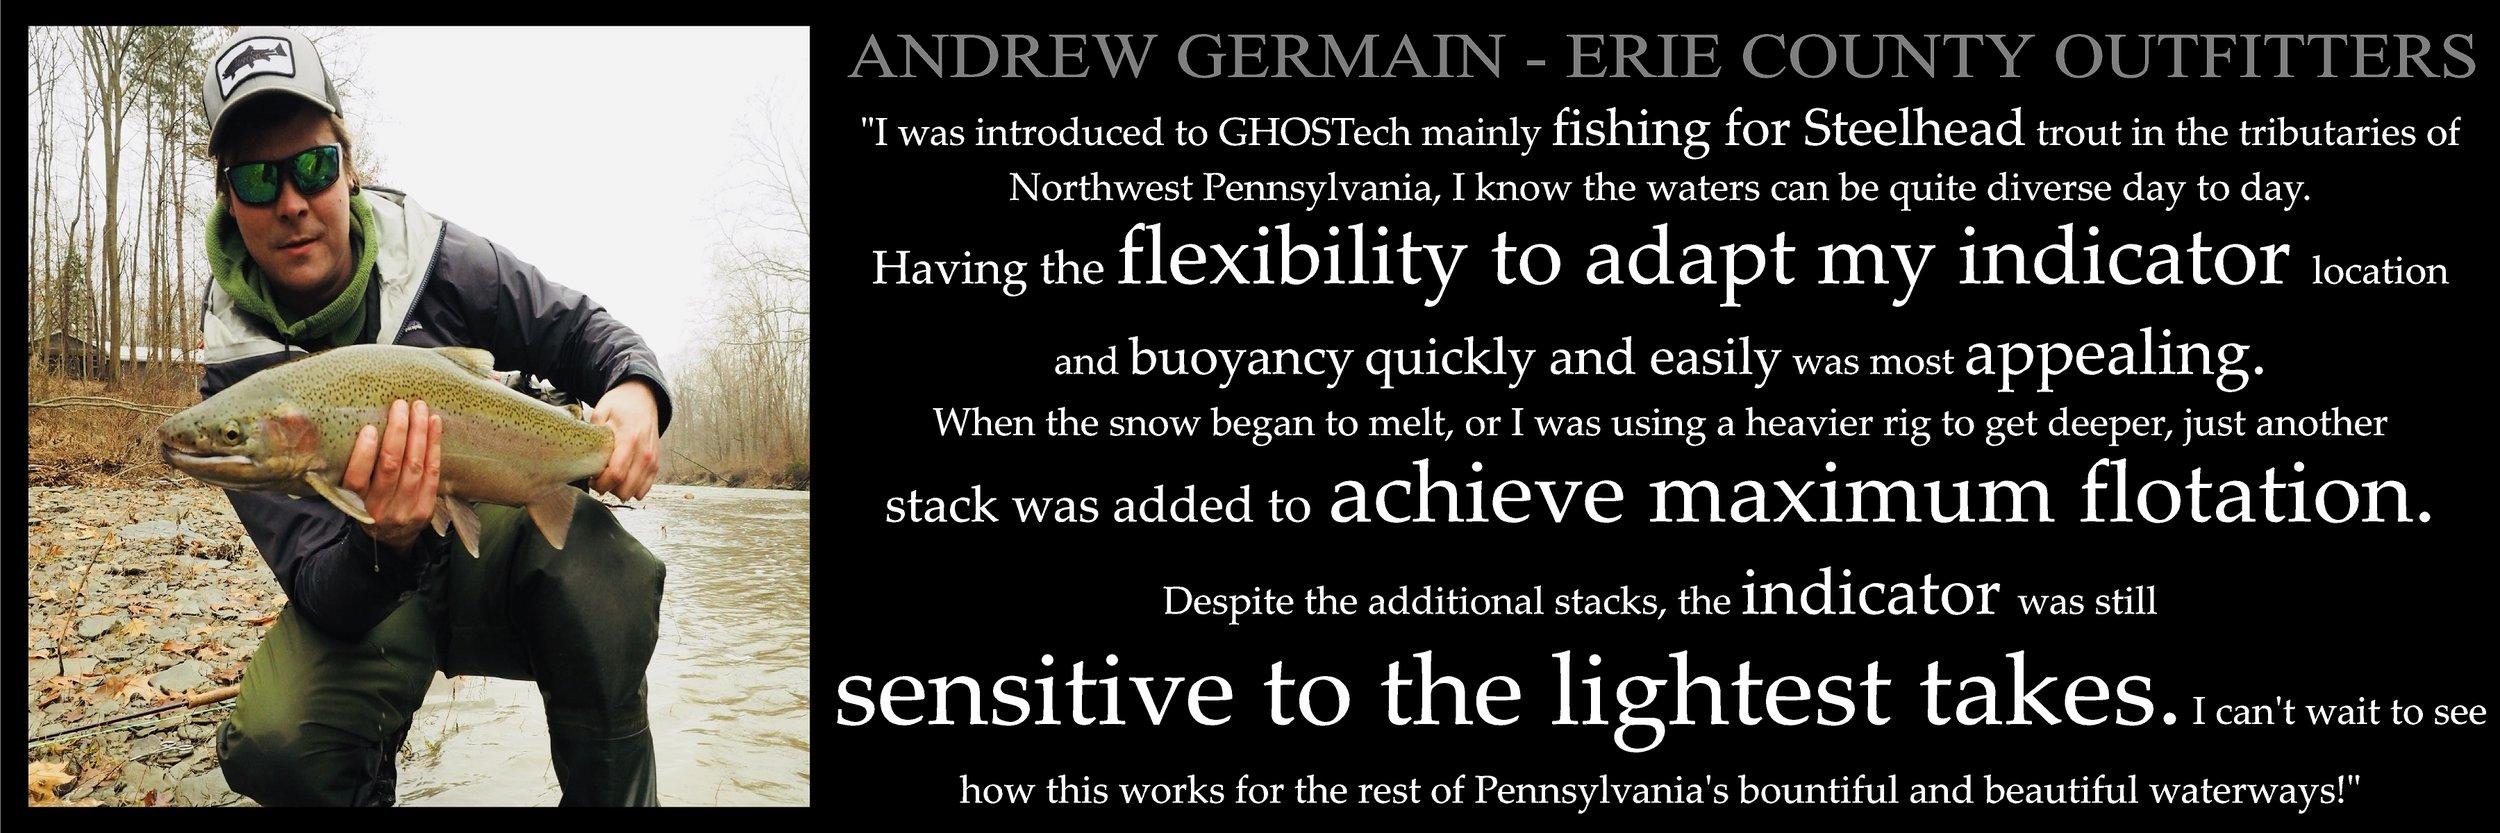 Ghostech testimonial rotator_06242019_Andrew Germain.jpg